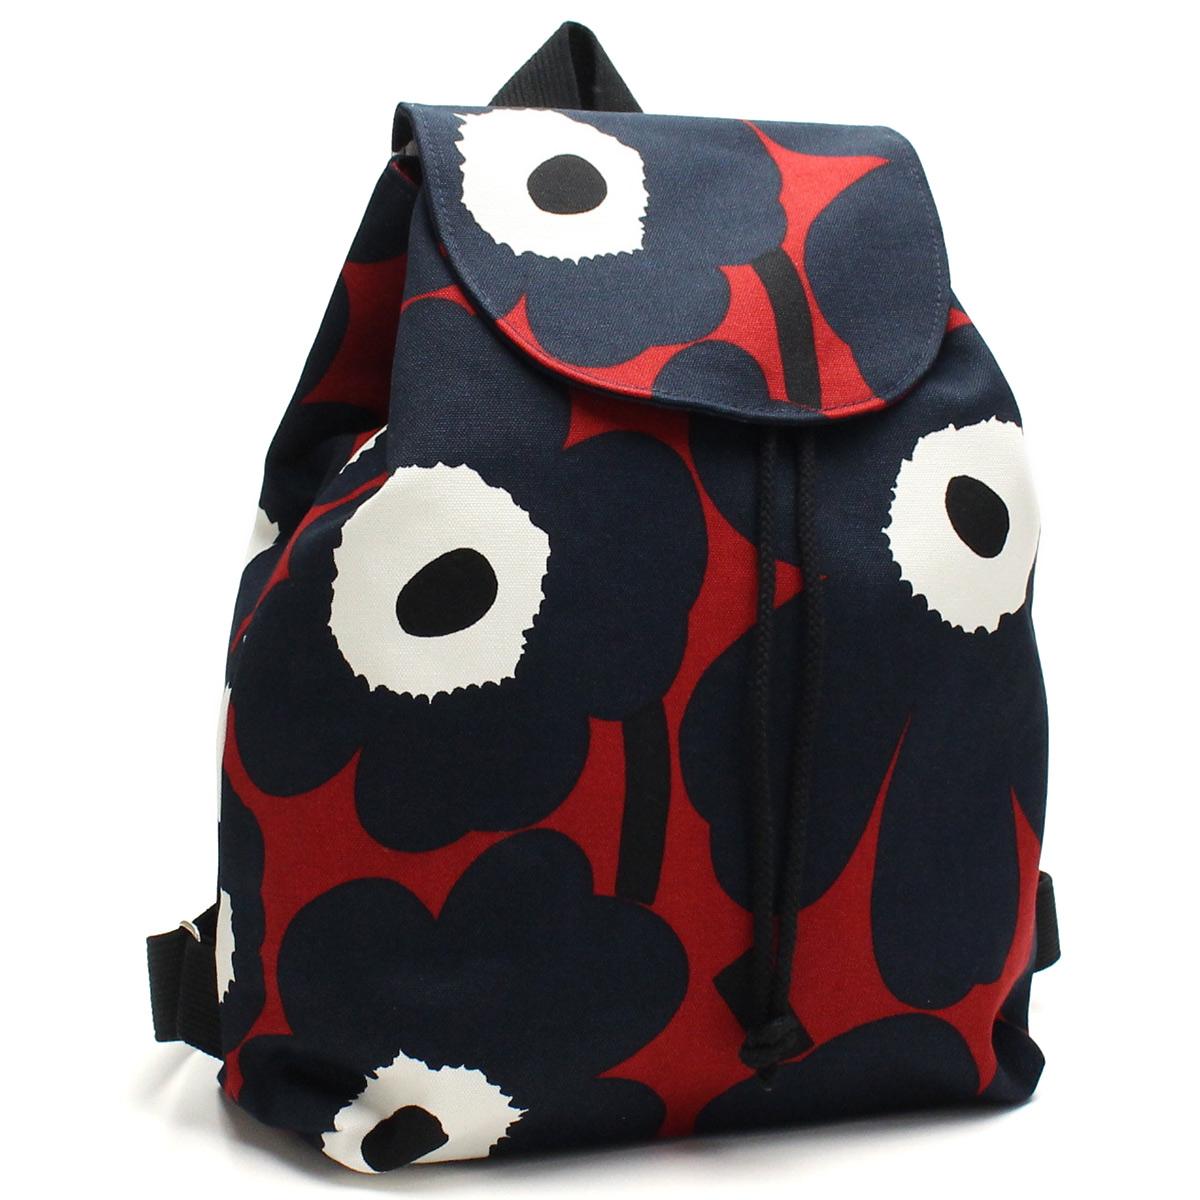 d3c16d9c9c Bighit The total brand wholesale  Marimekko (marimekko) ERIKA UNIKKO  backpack 40967-359( taxfree send by EMS authentic A brand new item )